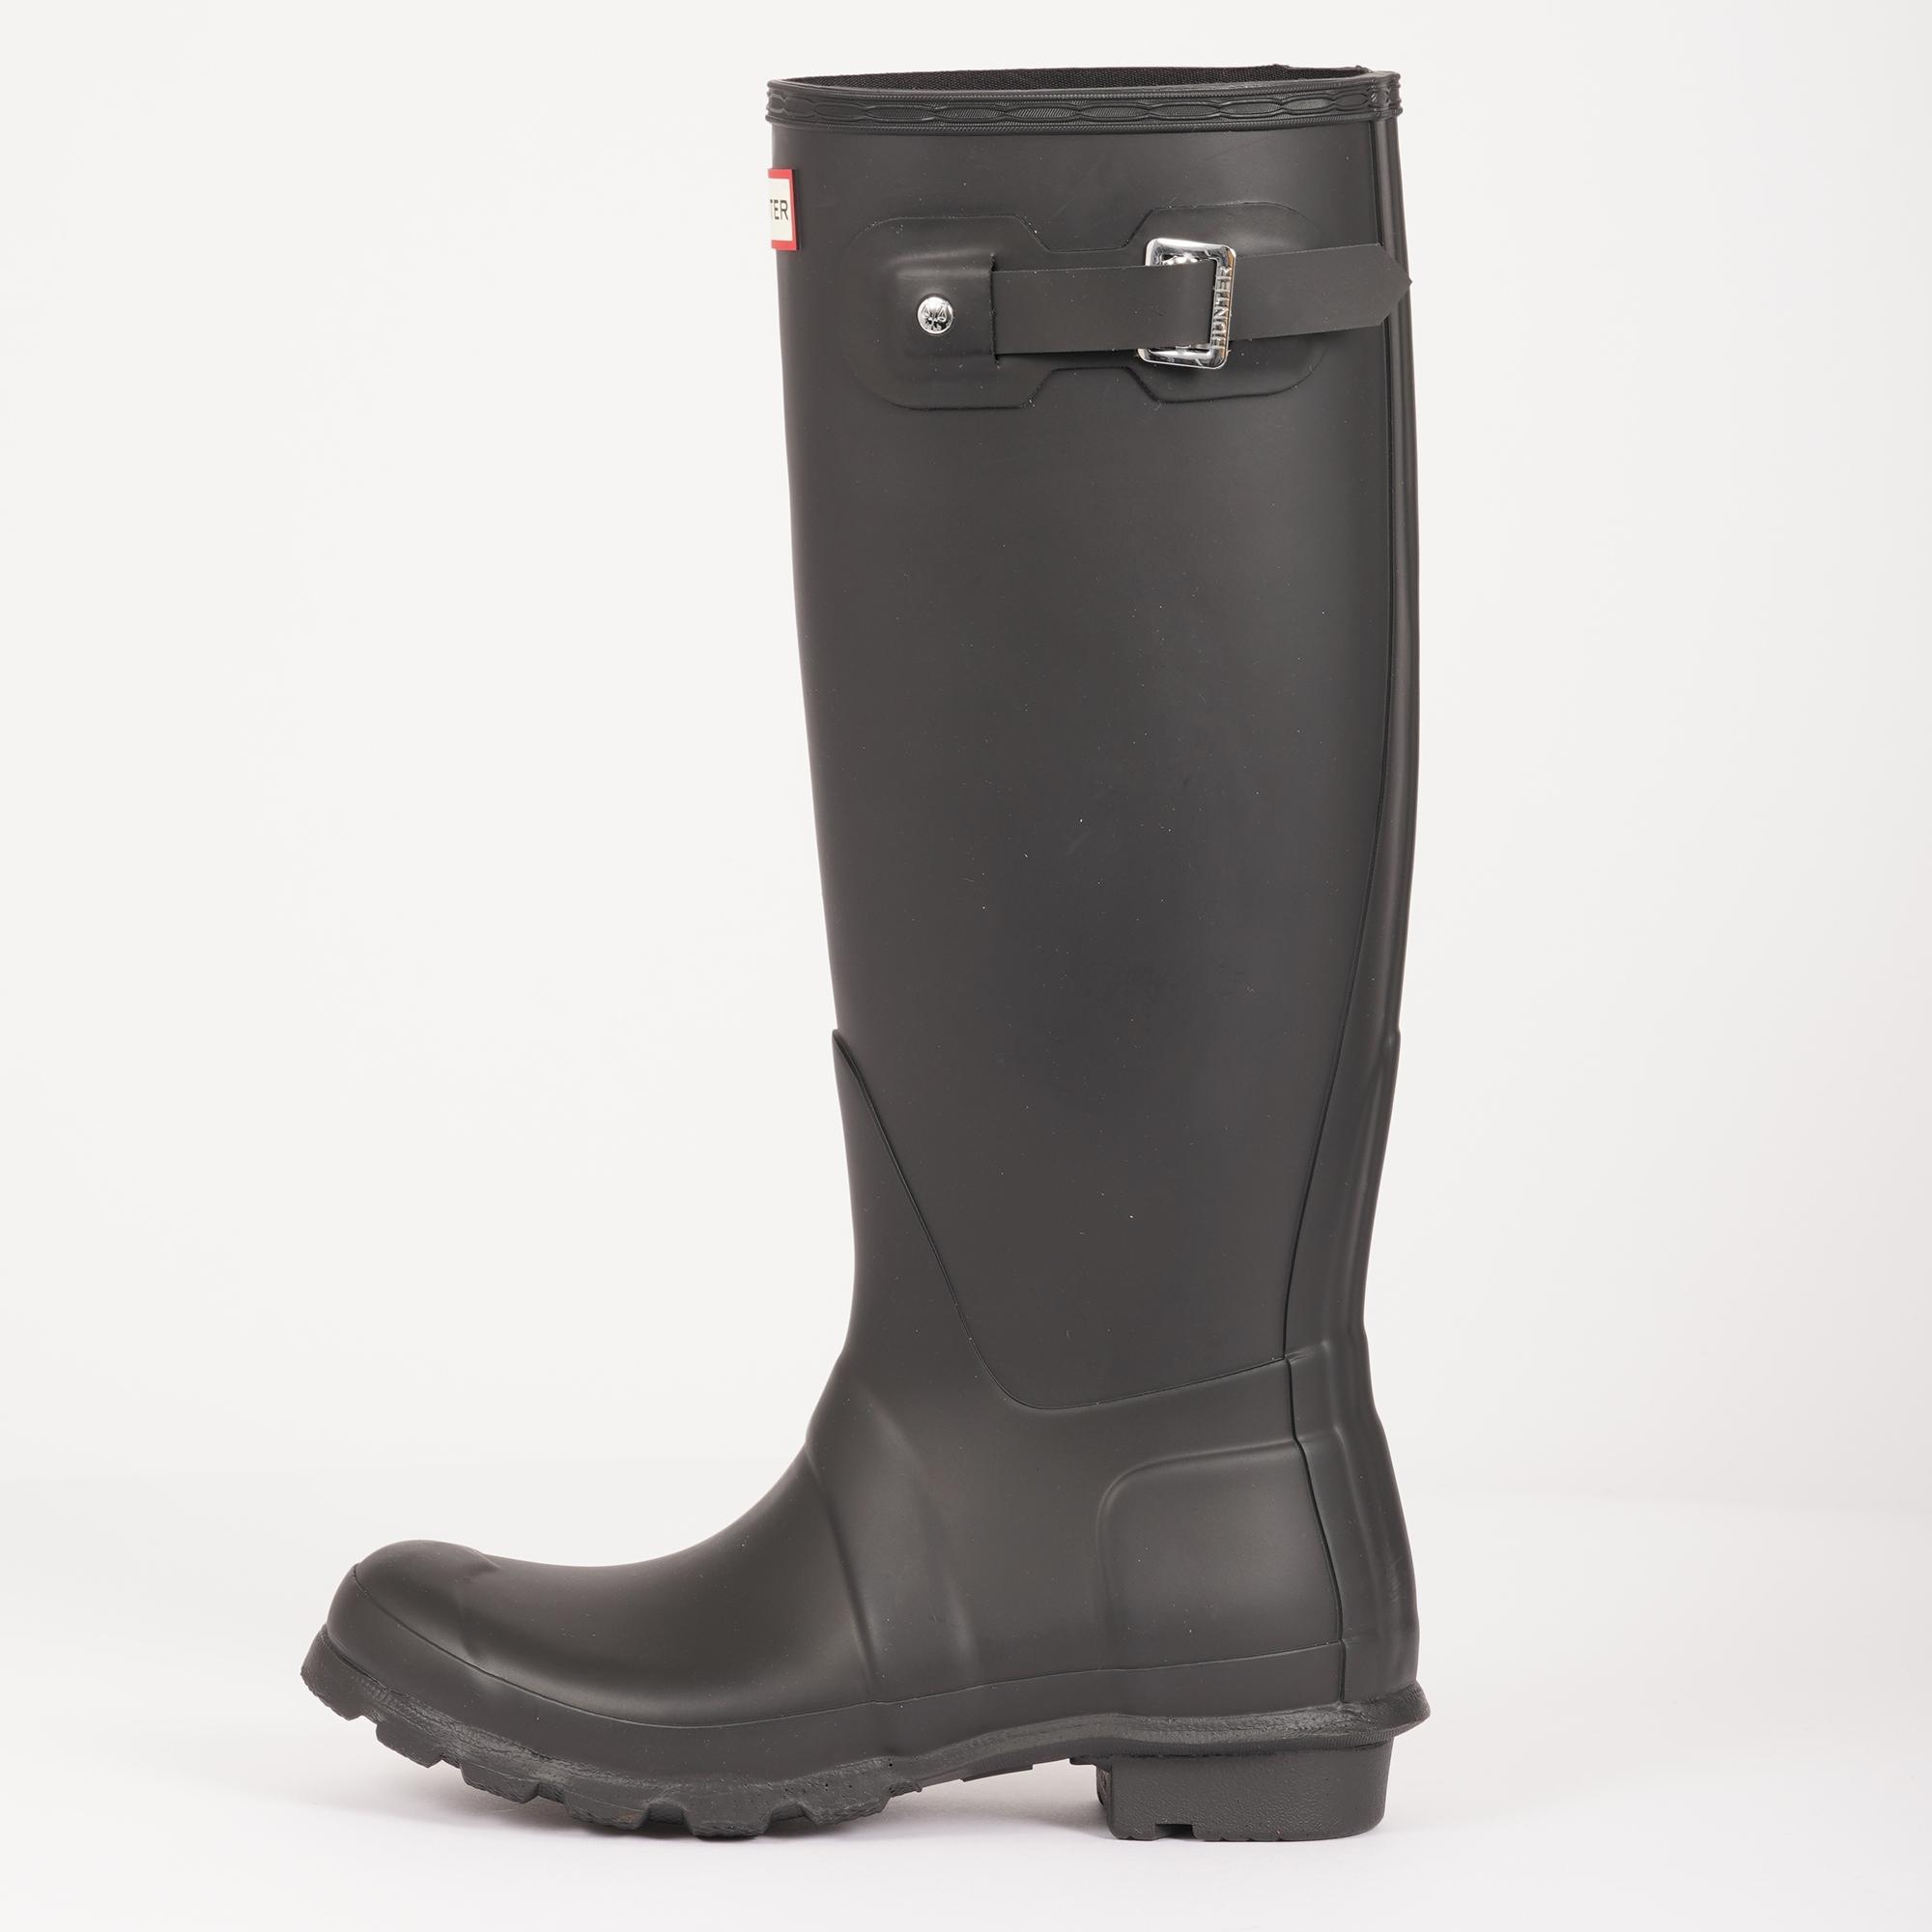 f587ec75a8f797 hunter-womens-original-tall-wellington-boots-black-p40862-341920 image.jpg